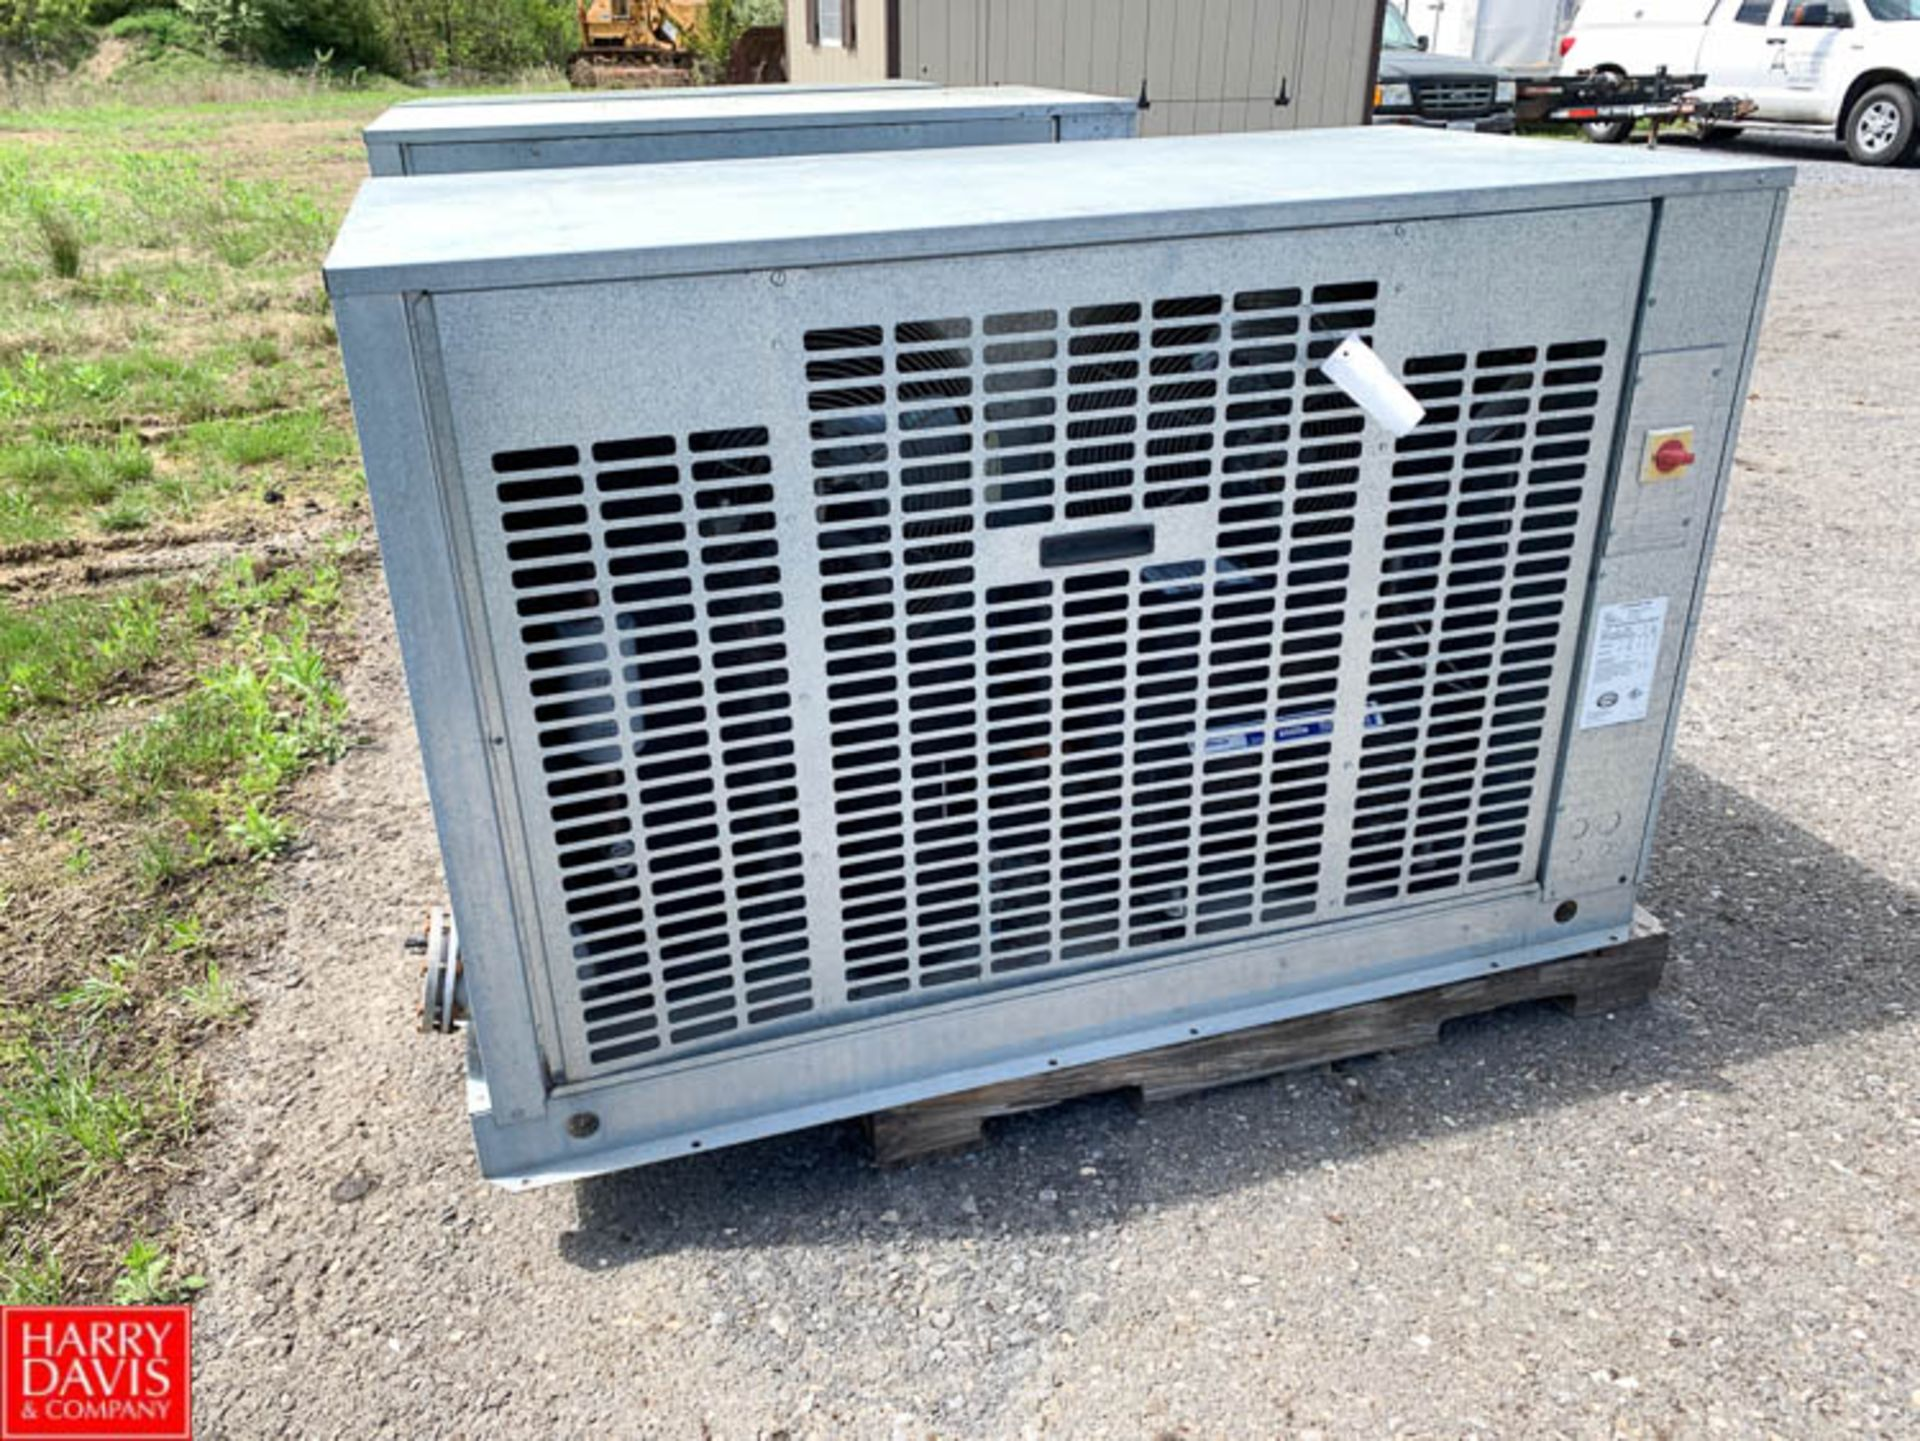 Lot 47 - Trenton Freon Condenser Unit, Model TESA-080H6-HTB4-3747, R404/R507 Refrigerant - Rigging Fee: $25